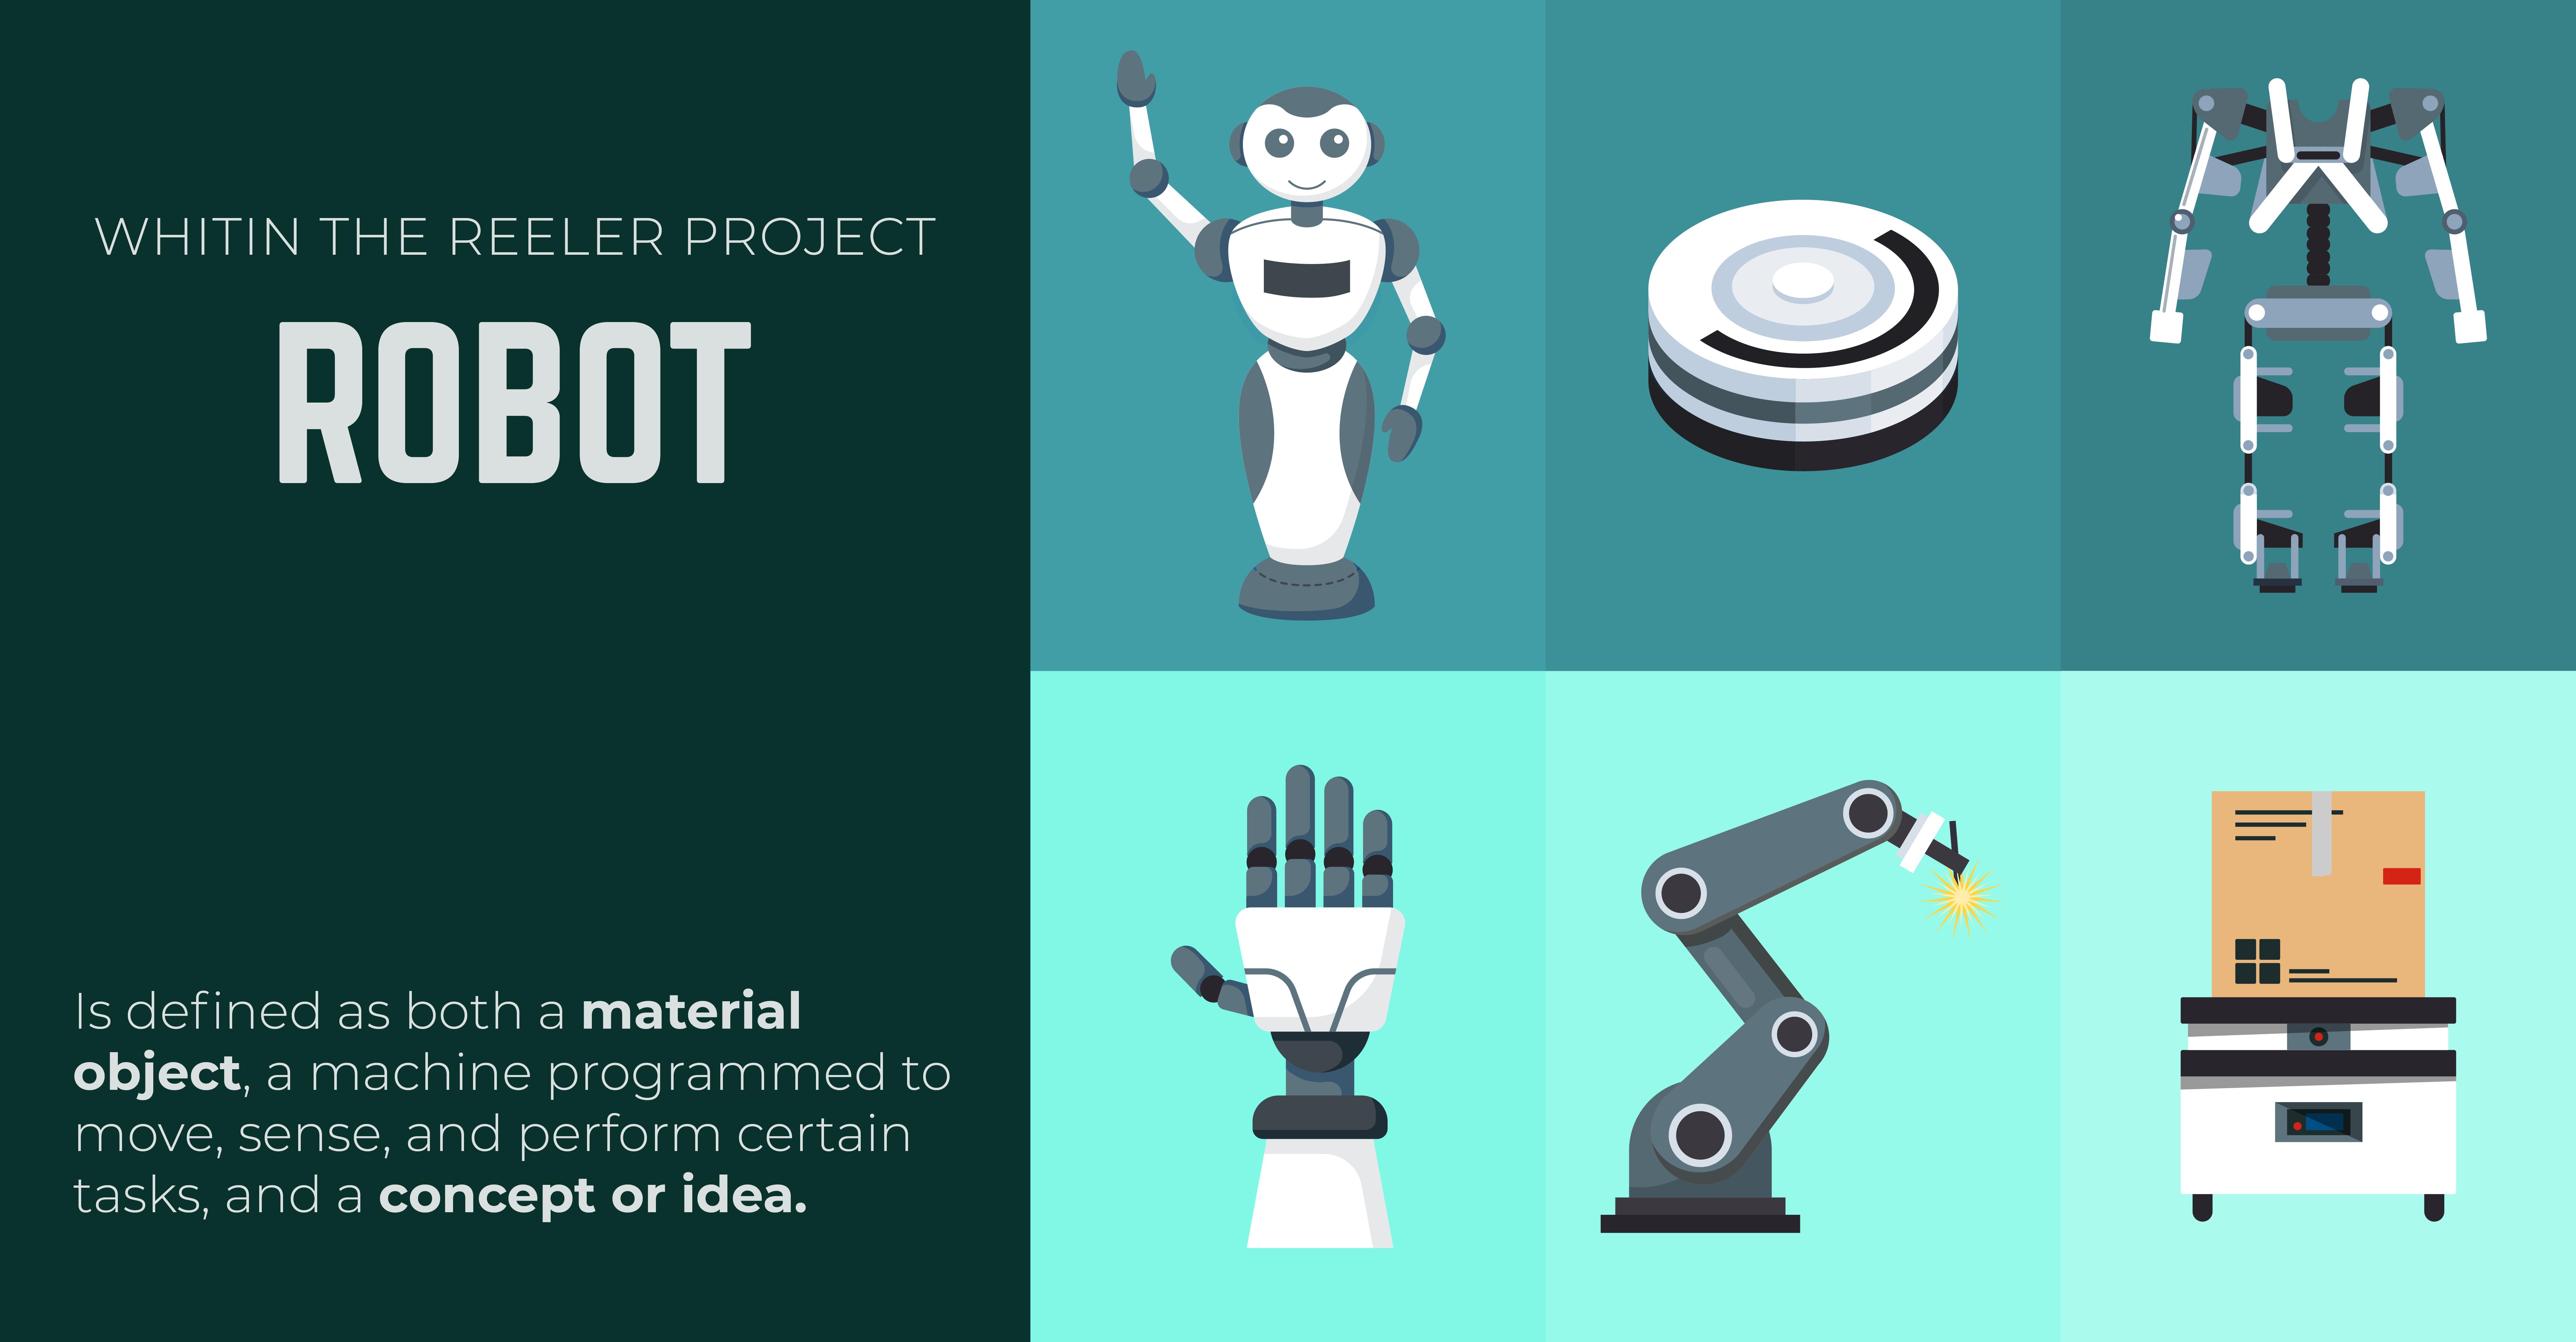 RobotDefinition_2